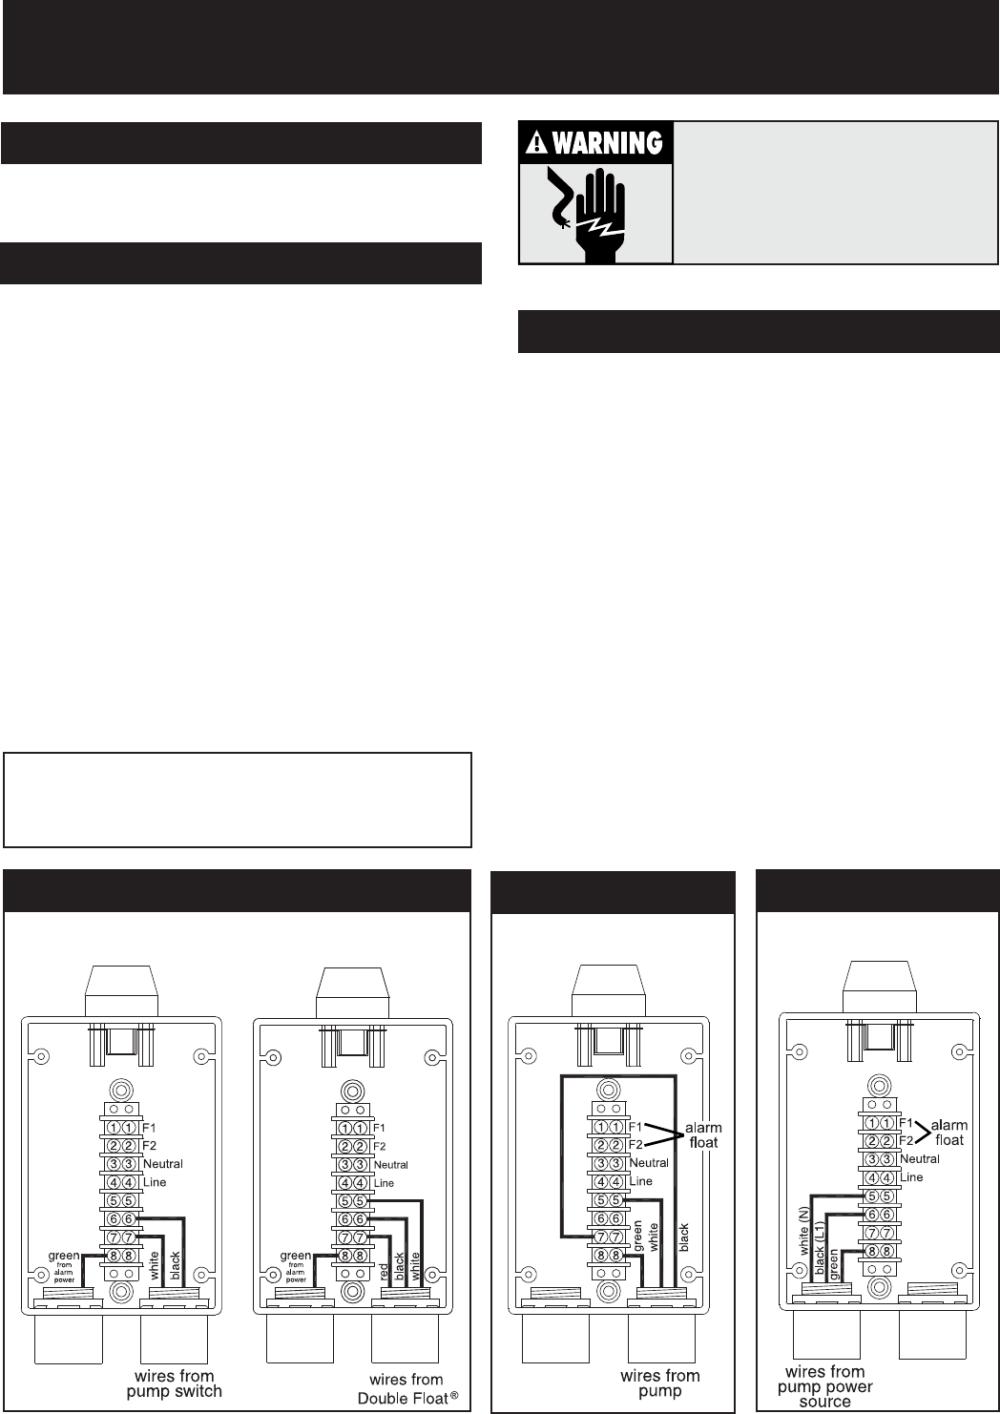 medium resolution of 1011020g tb wiring instr pmd 550334 4 sje rhombus tank alert xt sje rhombus tank alert ab wiring diagram tank alert wiring diagram